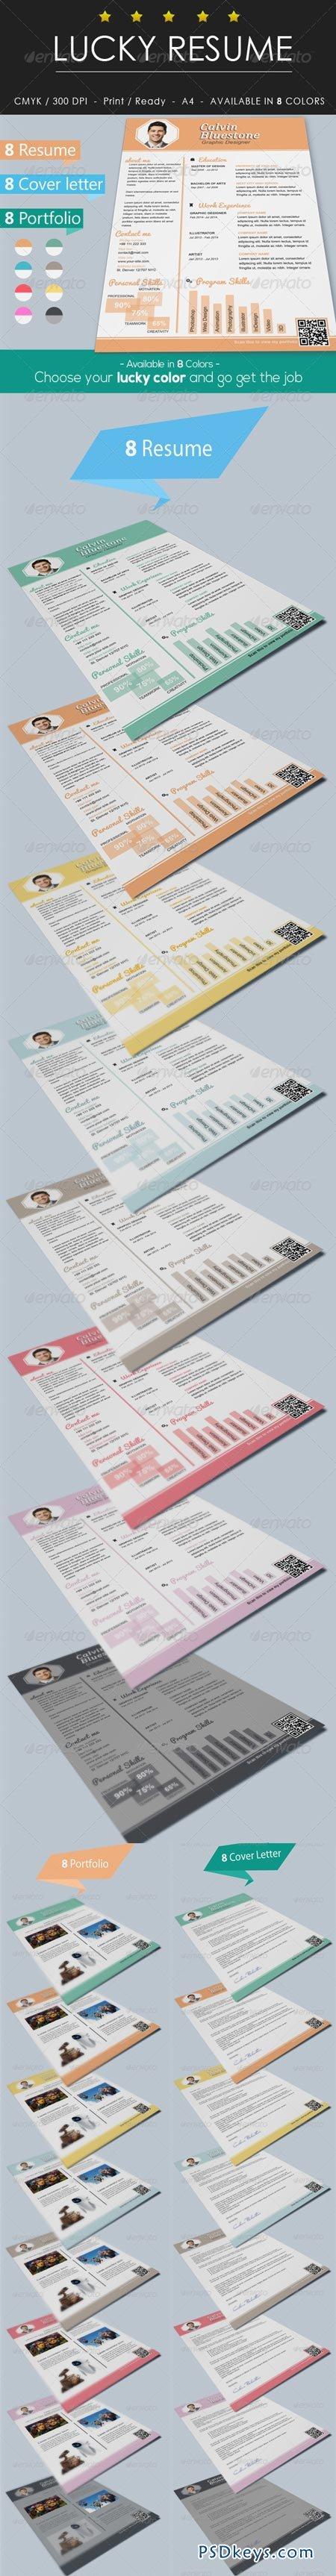 CV Themes x Essay Help online service